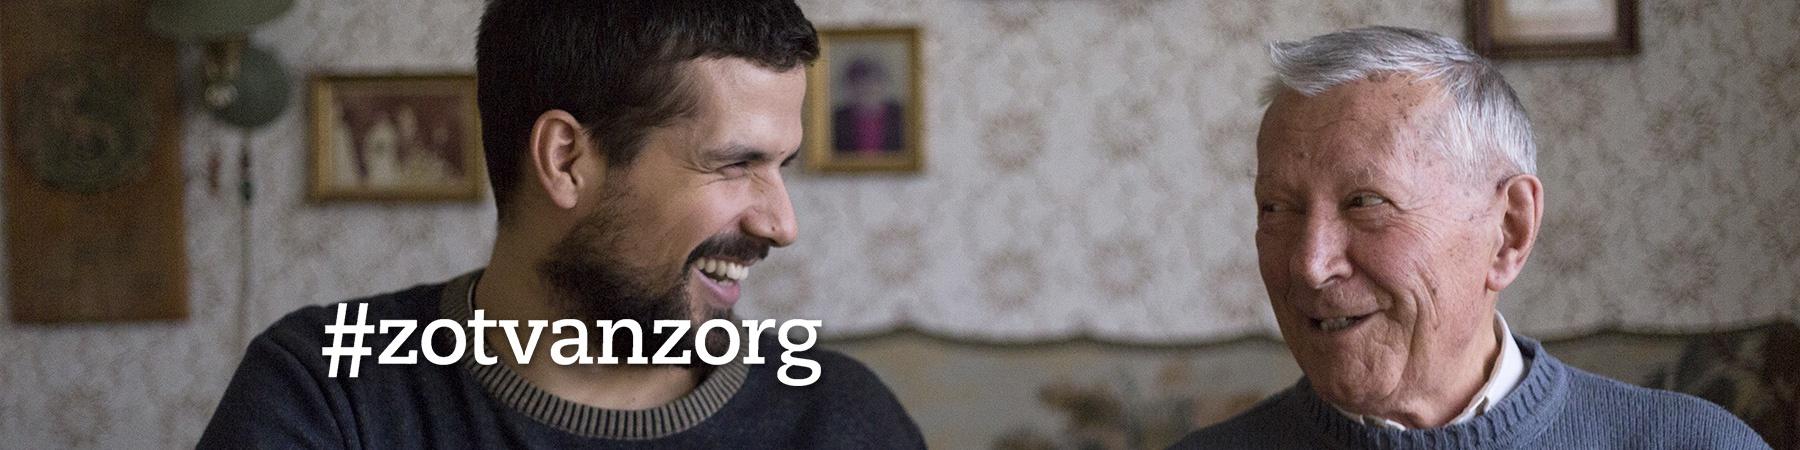 zotvanzorg_website_4_8.jpg